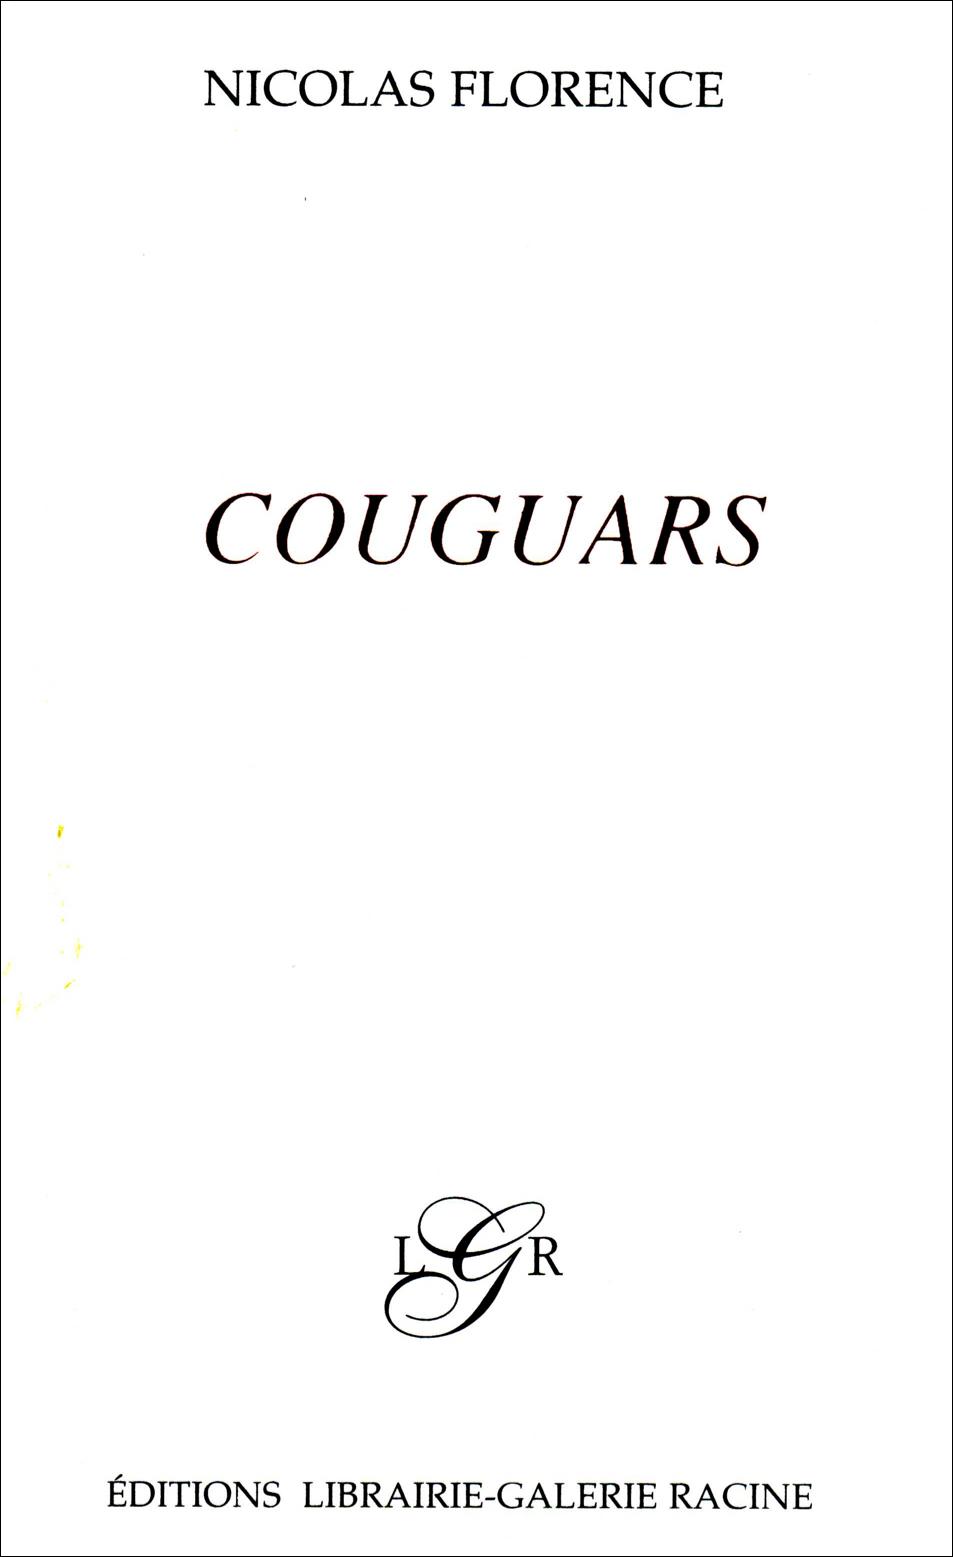 Nicolas Florence - Cougars